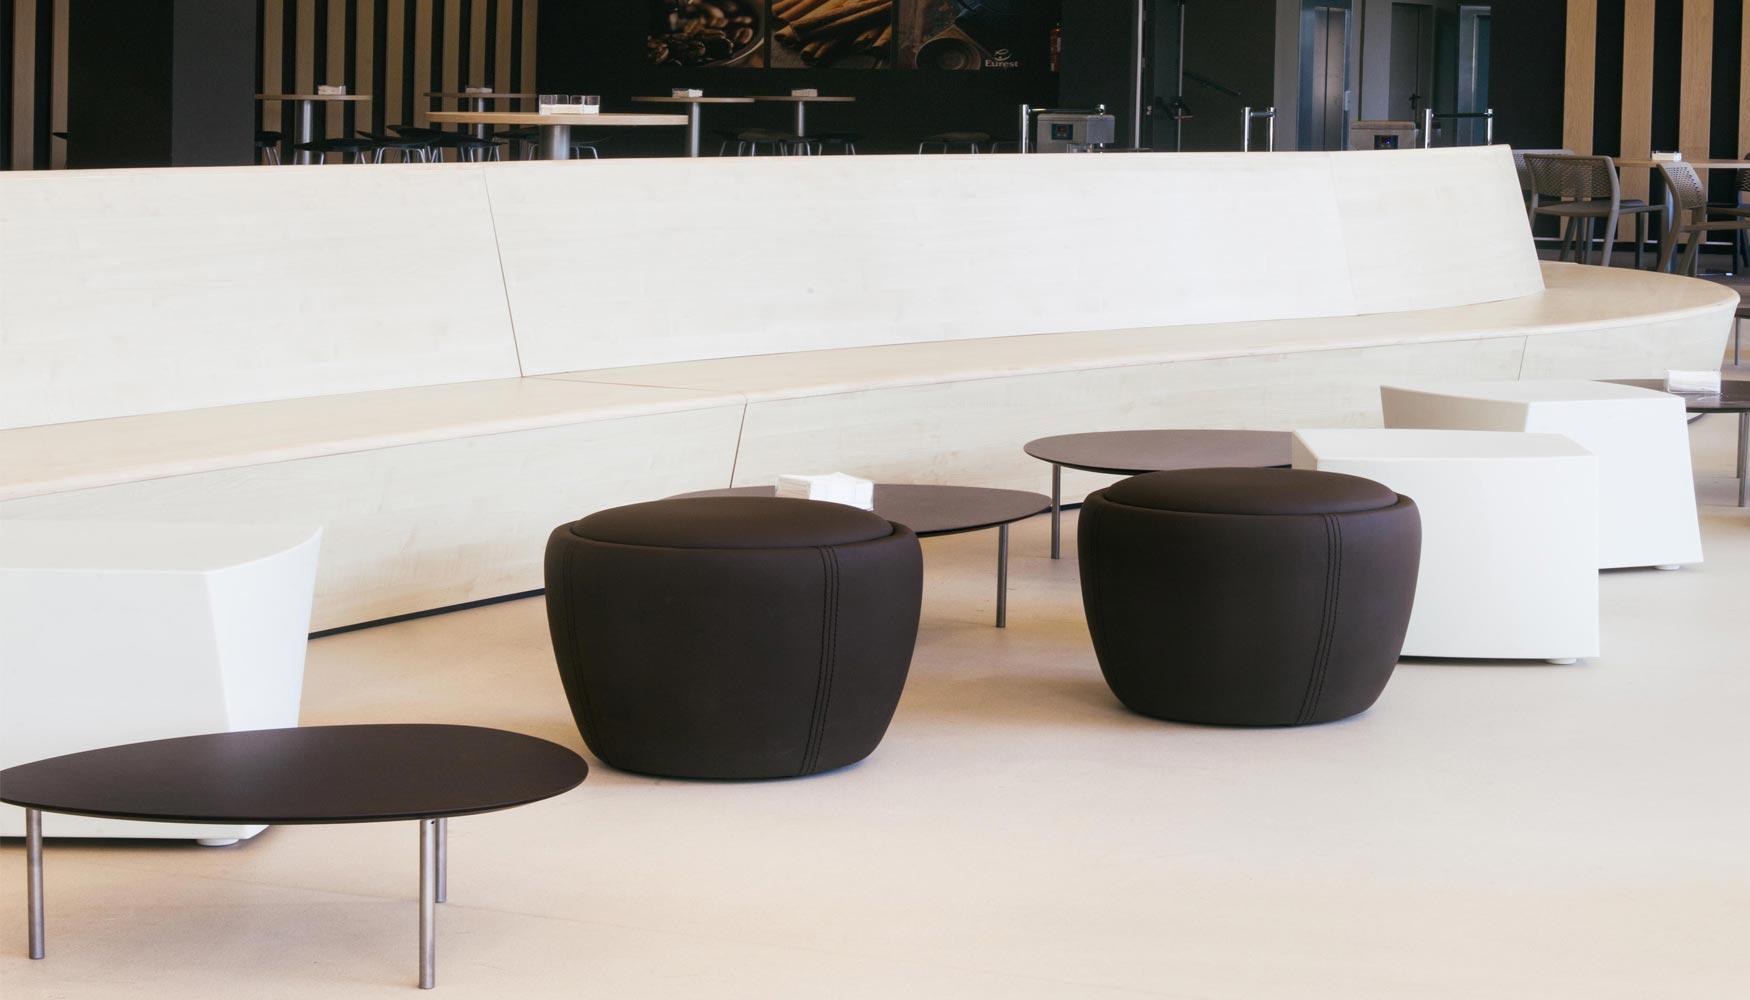 foto cafeteria espanola diseno: